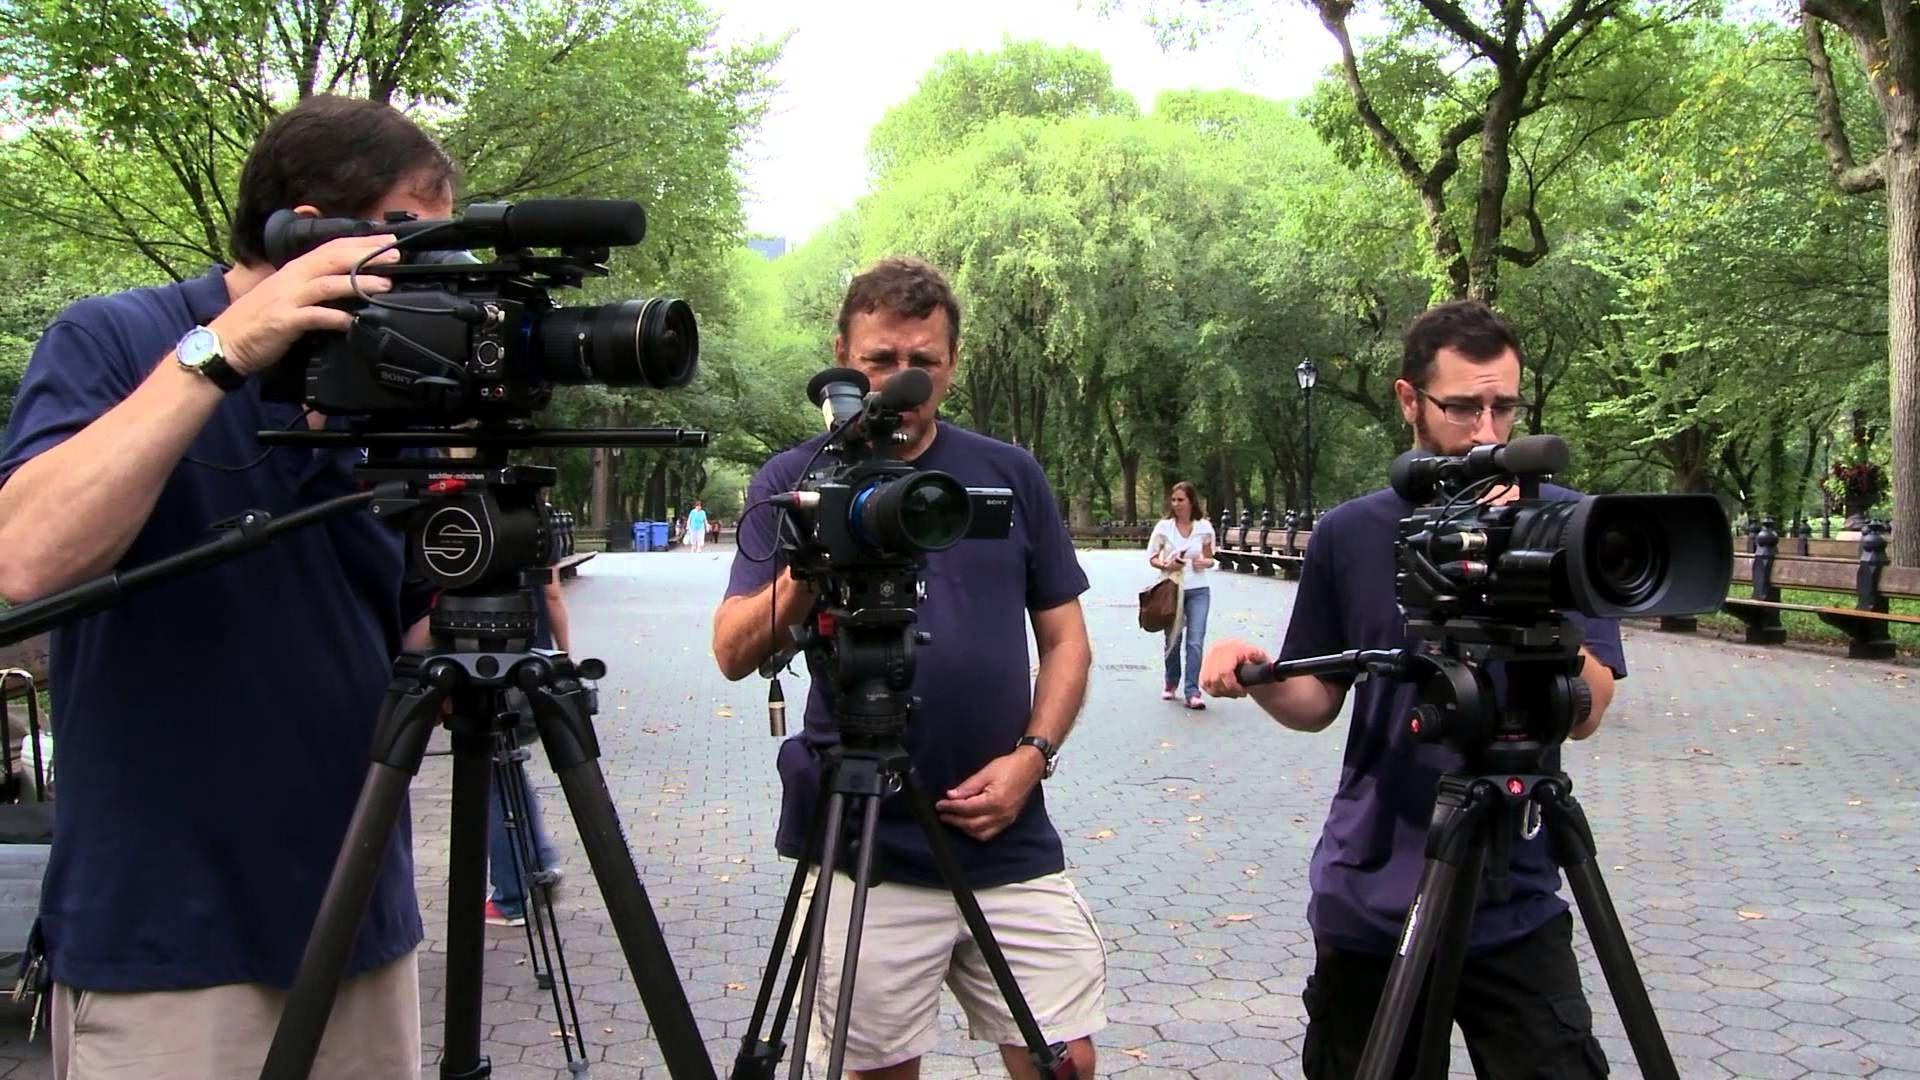 Multicamera Video Shoot Basics Match It Up